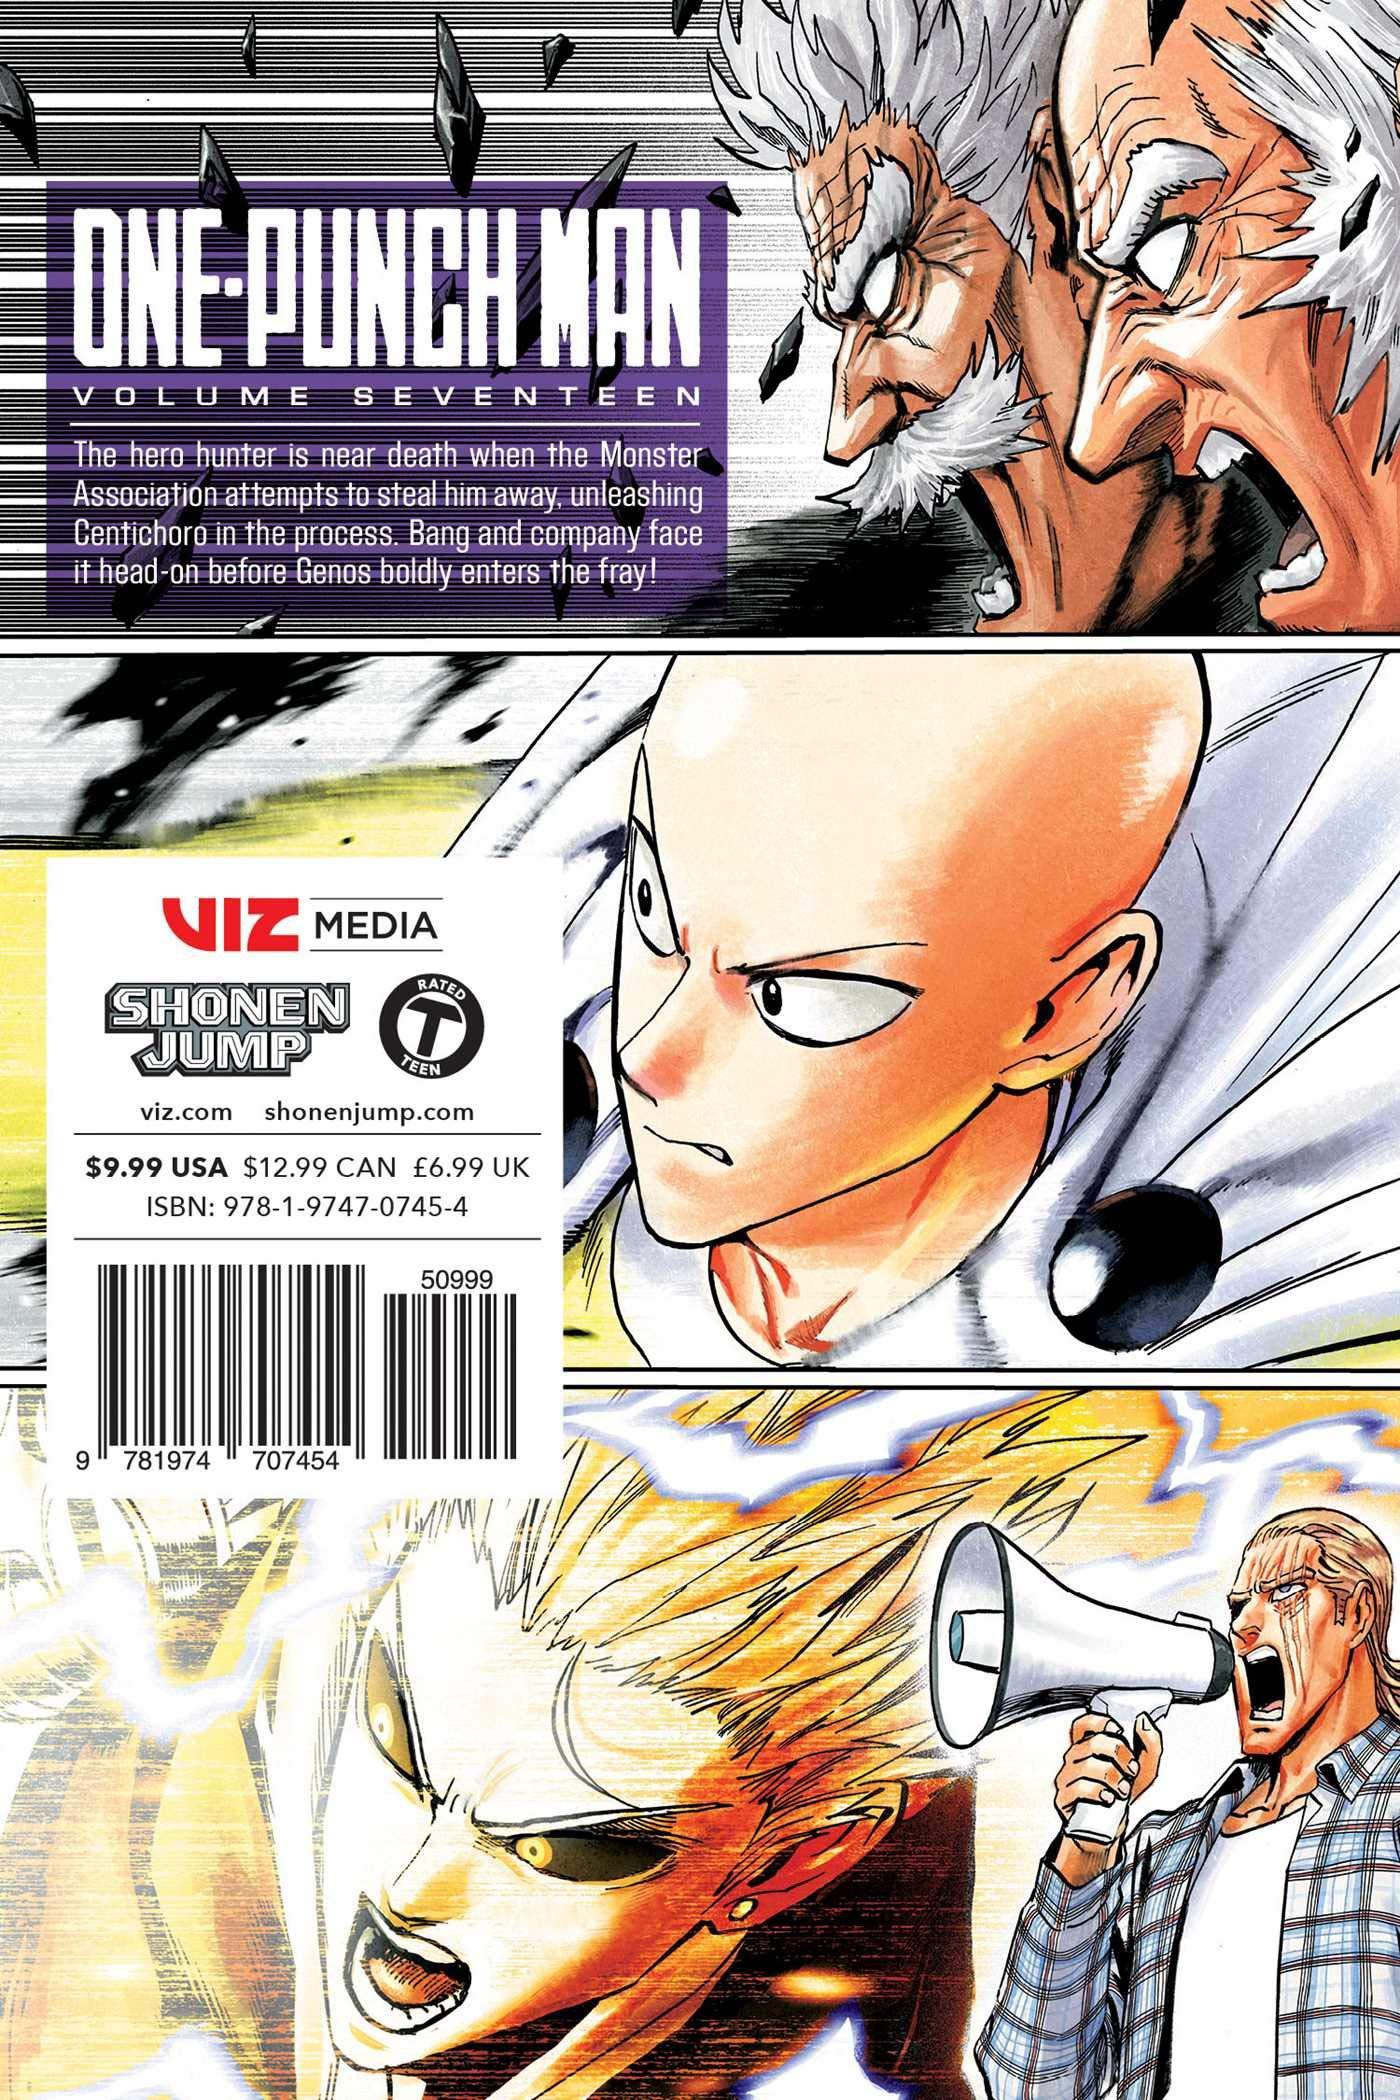 Amazon com: One-Punch Man, Vol  17 (17) (9781974707454): ONE